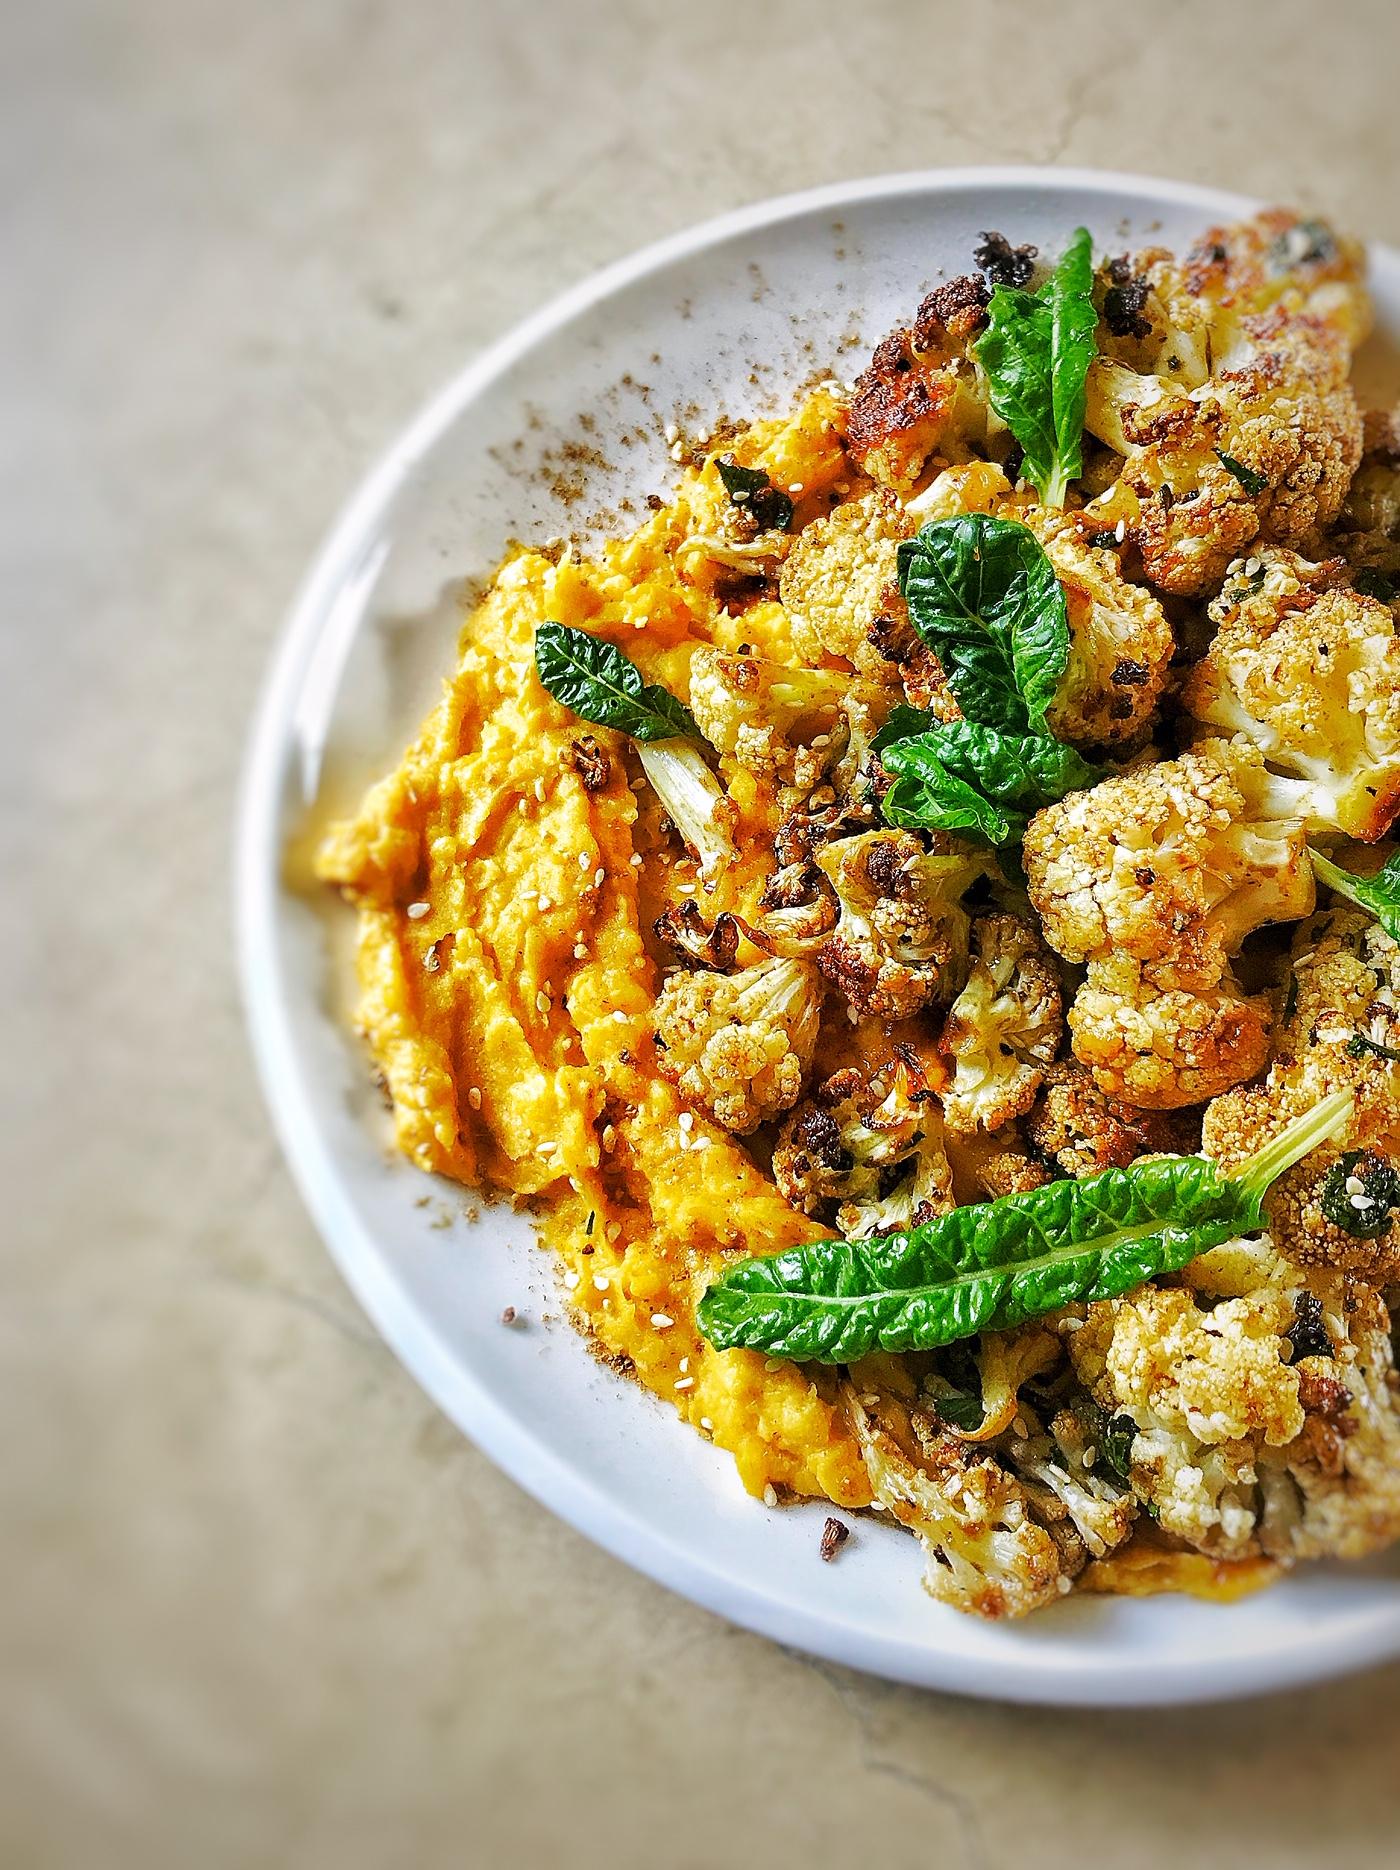 Roasted Cauliflower Salad with Pumpkin and Butter Bean Hummus